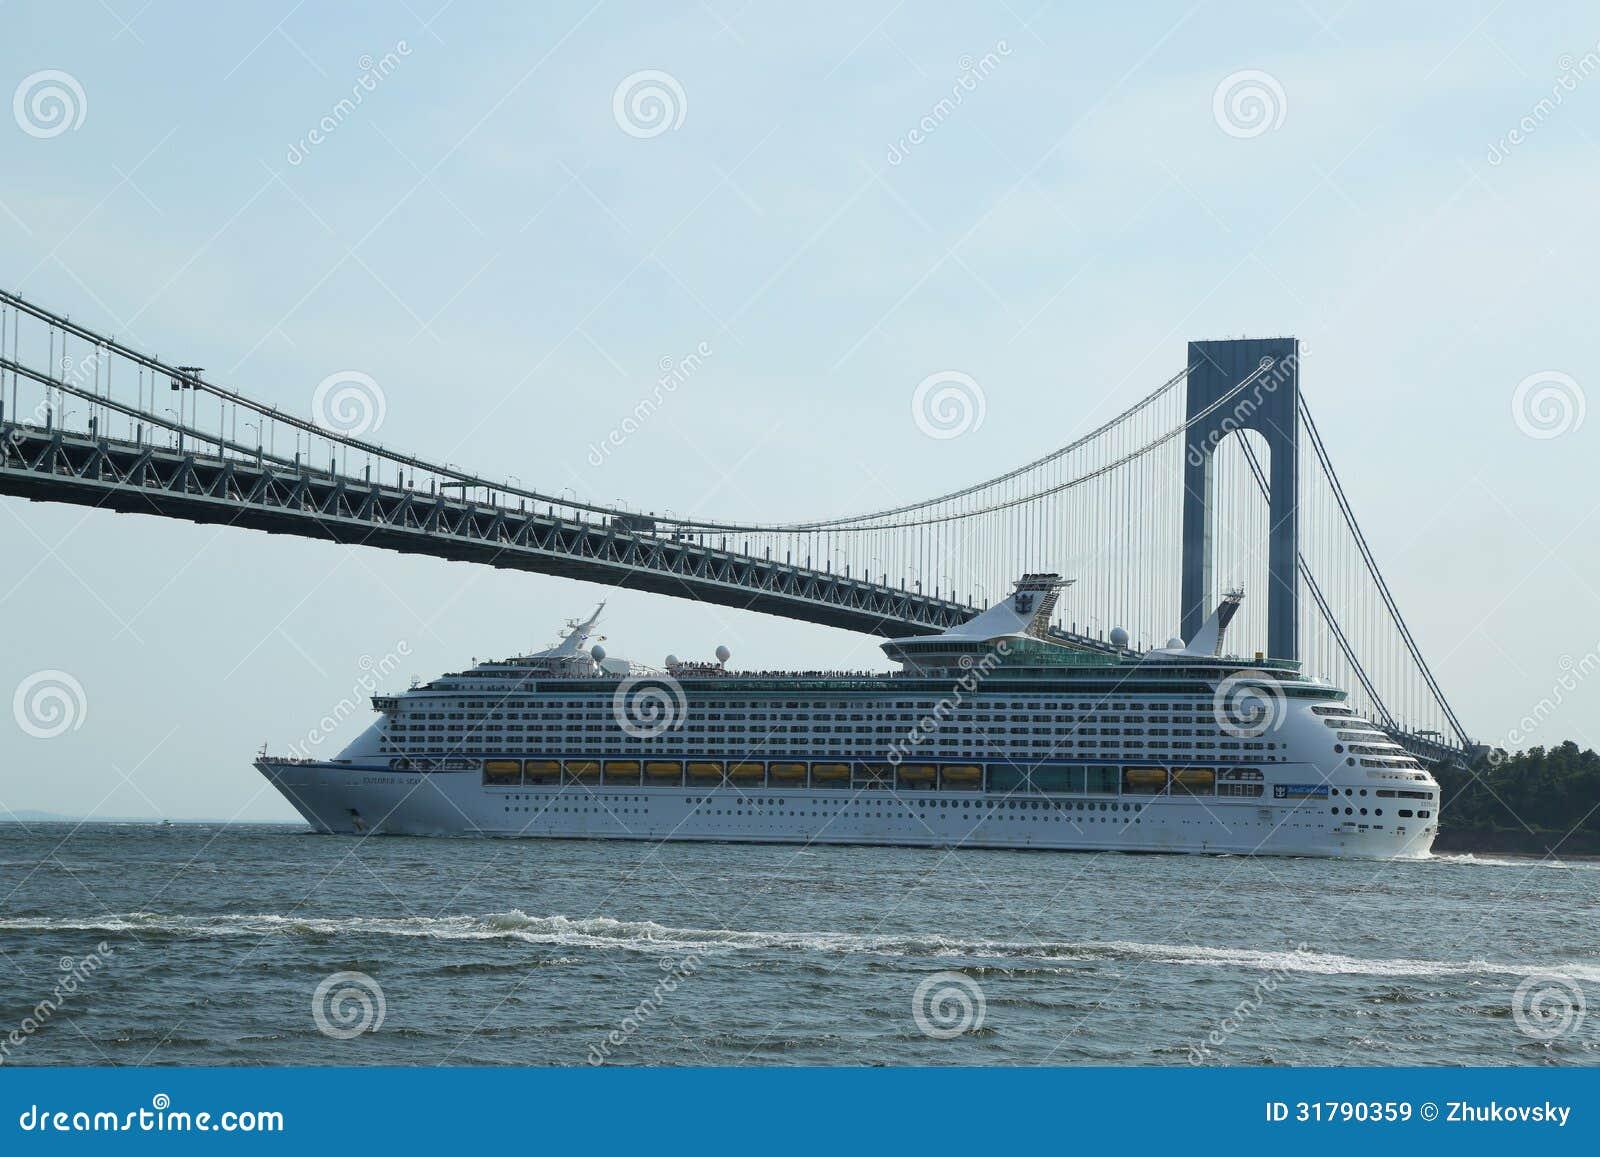 Royal Caribbean Explorer Of The Seas Cruise Ship Under Verrazano Bridge Editorial Stock Image